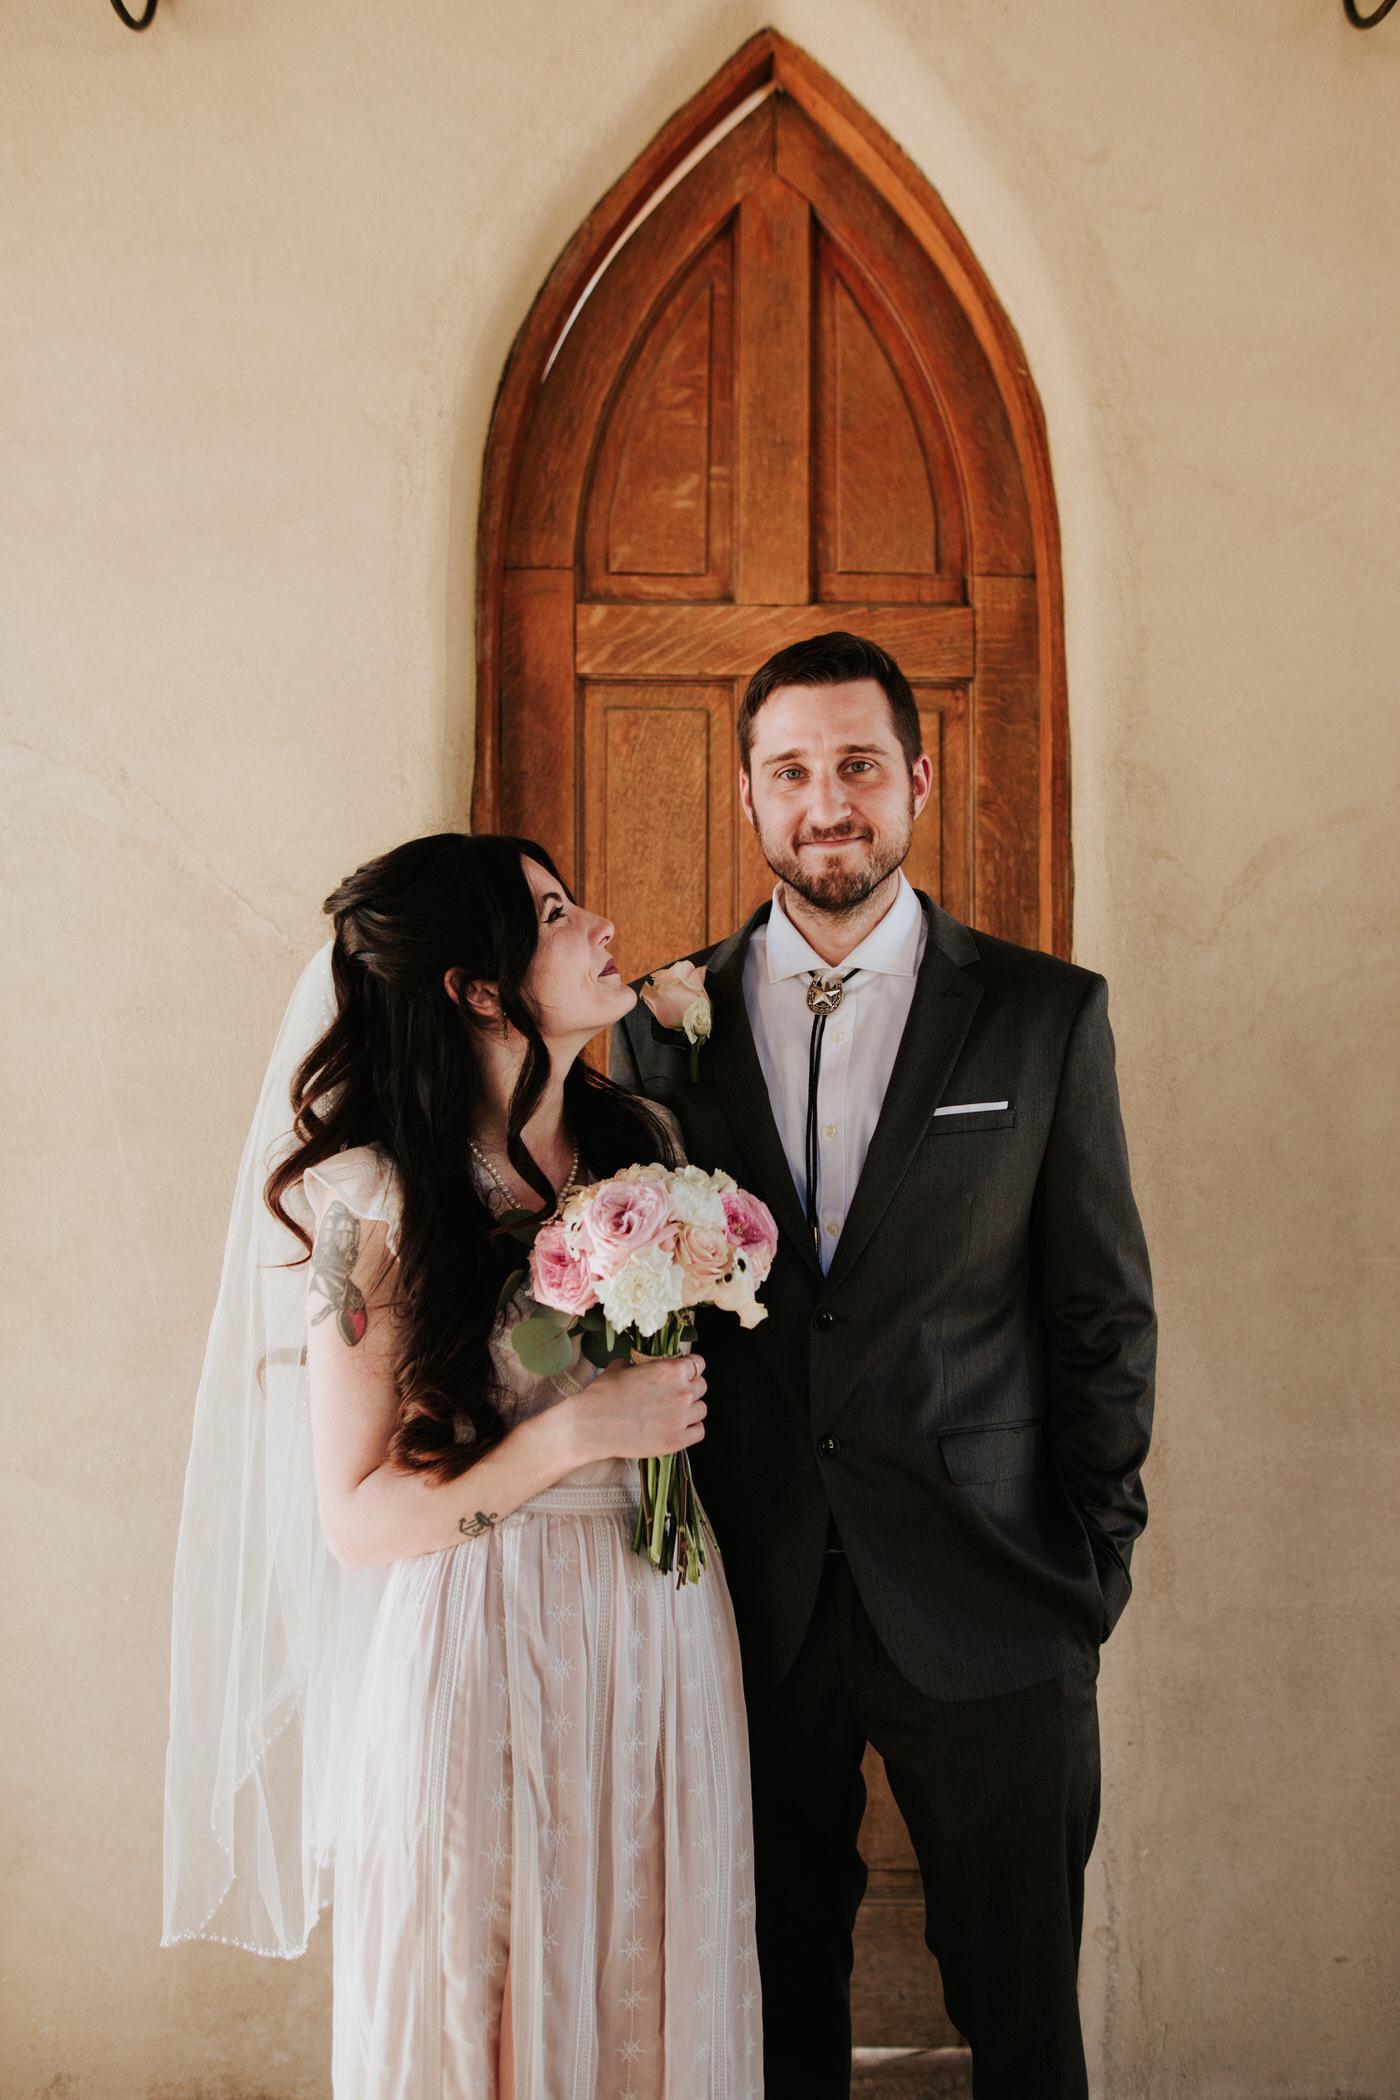 Chapel Dulcinea Vow Renewal Wedding - Diana Ascarrrunz Photography -206.jpg